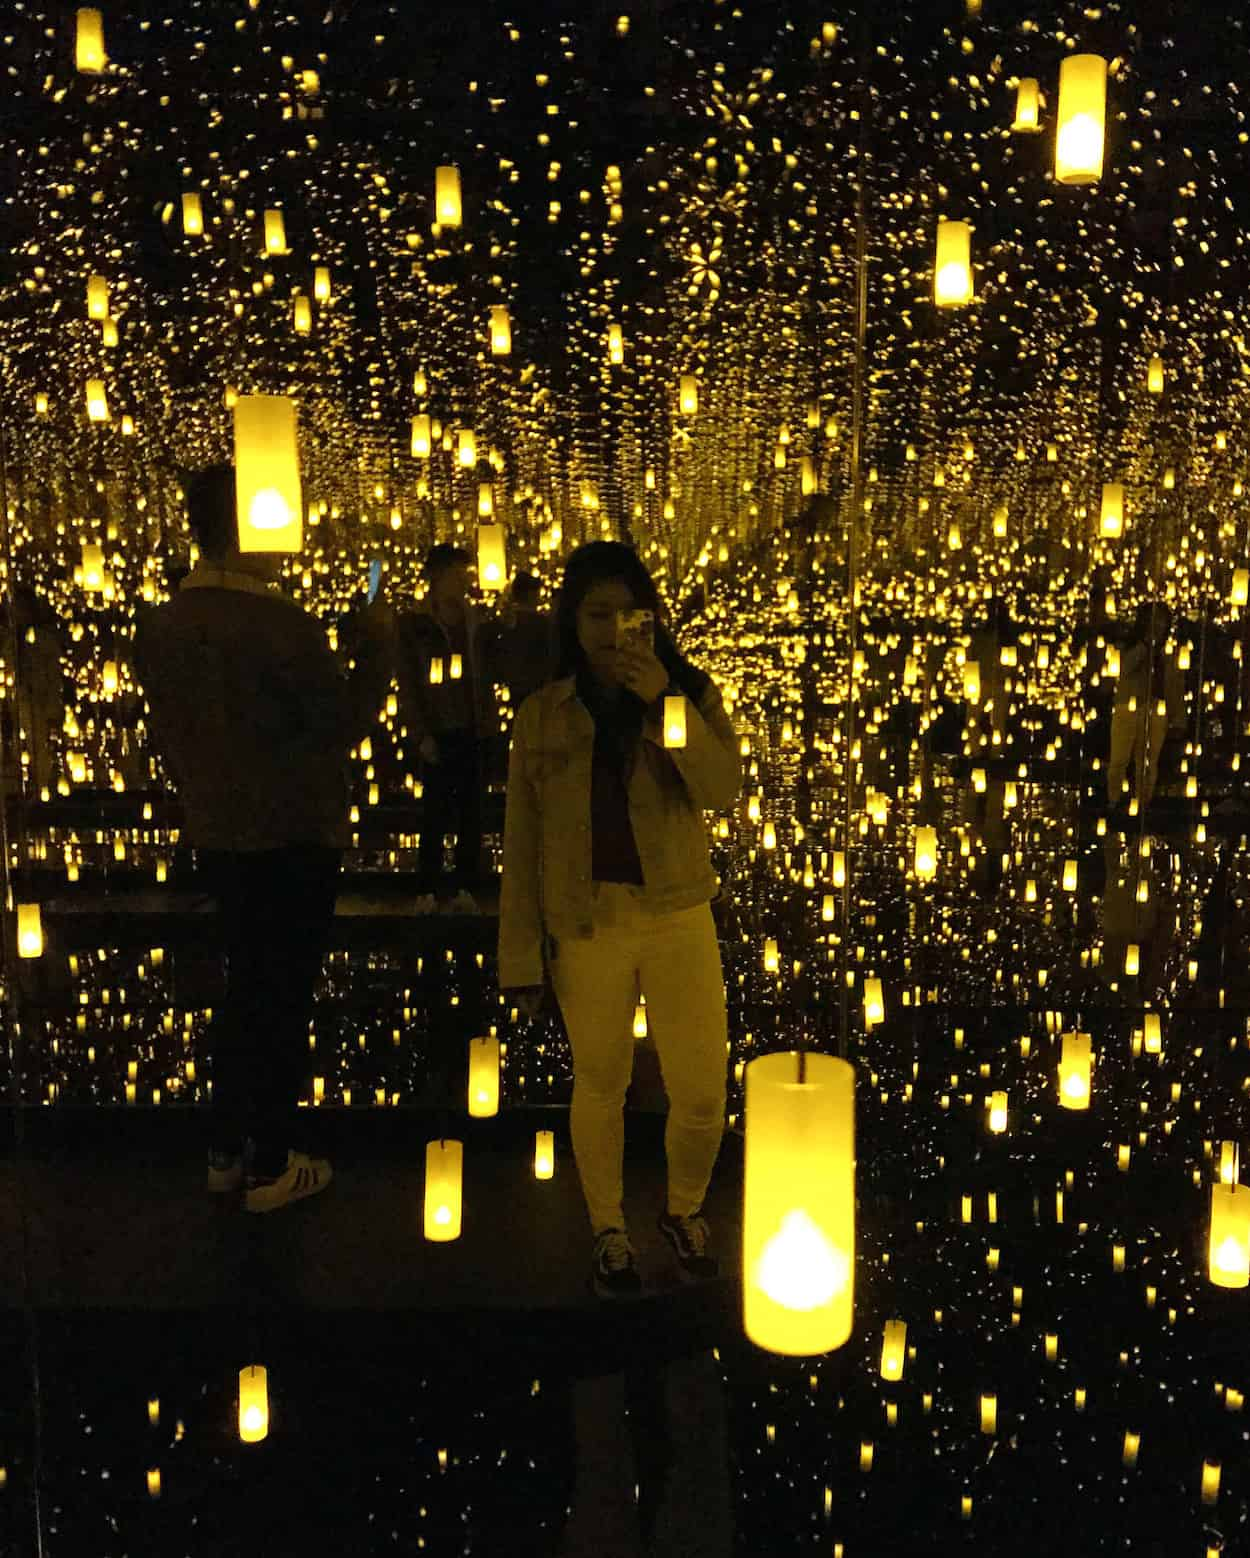 Yayoi Kusama's Infinity Mirrors at the Art Gallery of Ontario in Toronto   Yayoi Kusama Exhibition at the AGO   Toronto, Canada